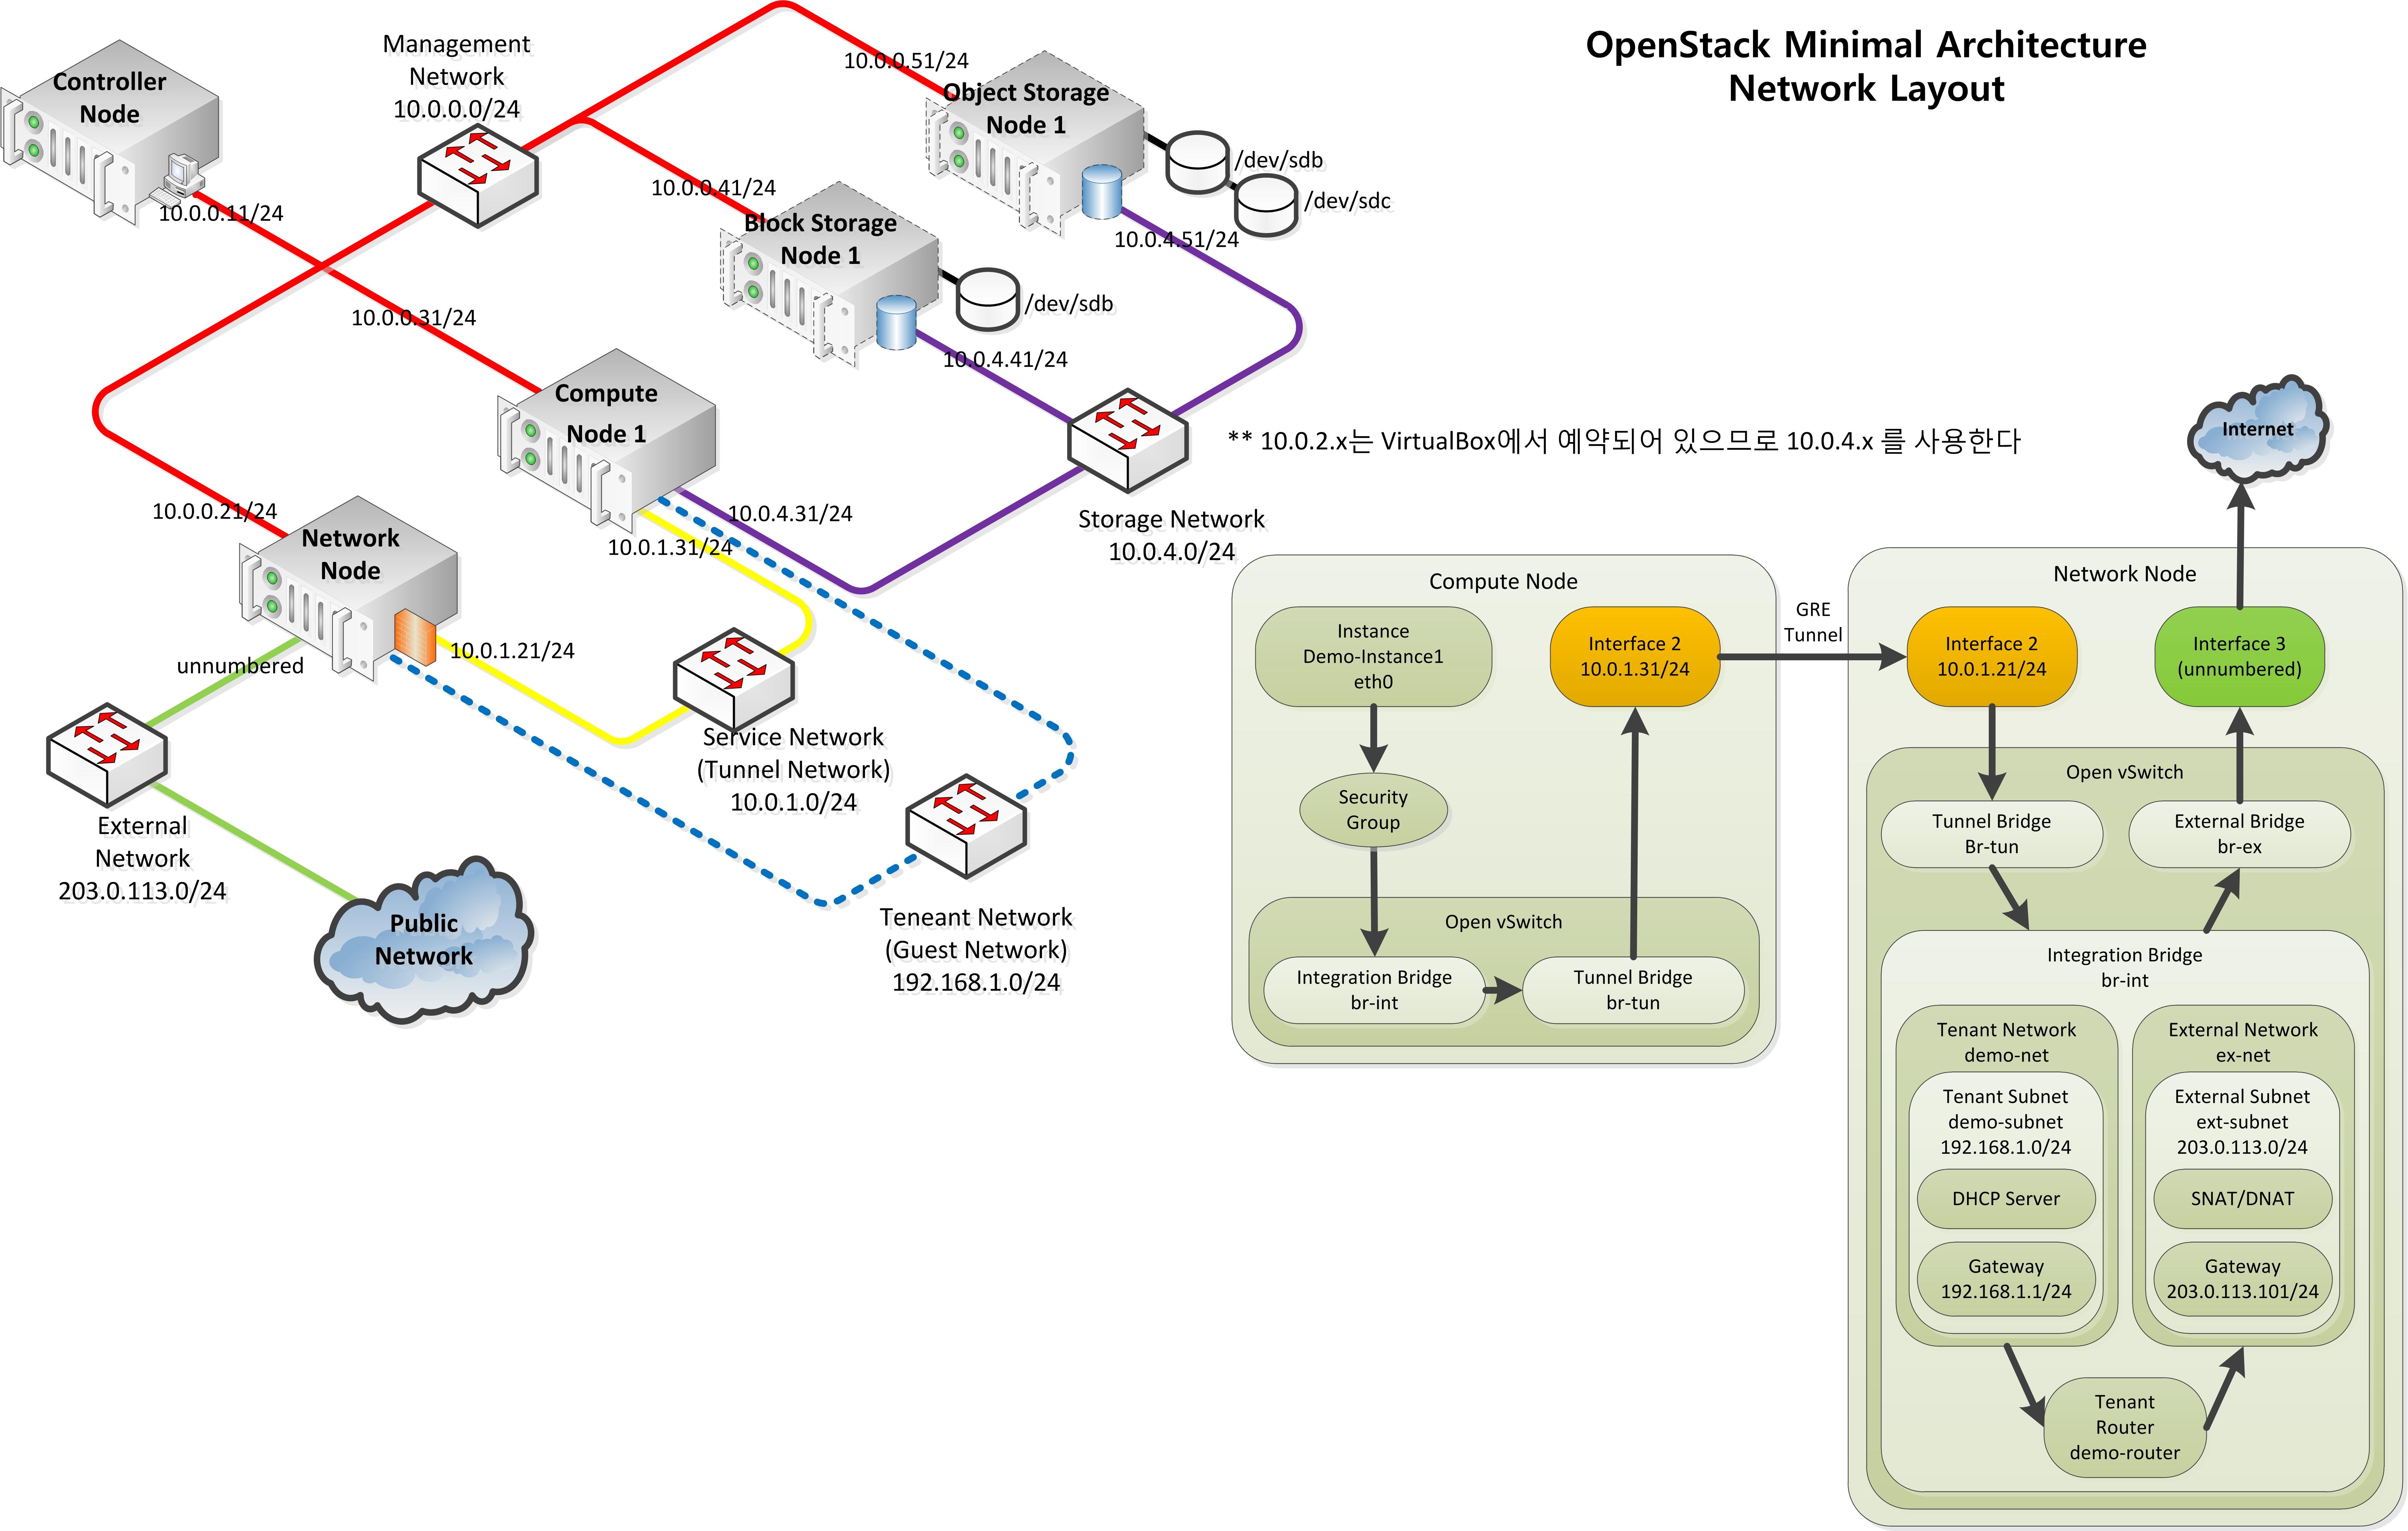 OpenStack Minimal Architecture Network Layout